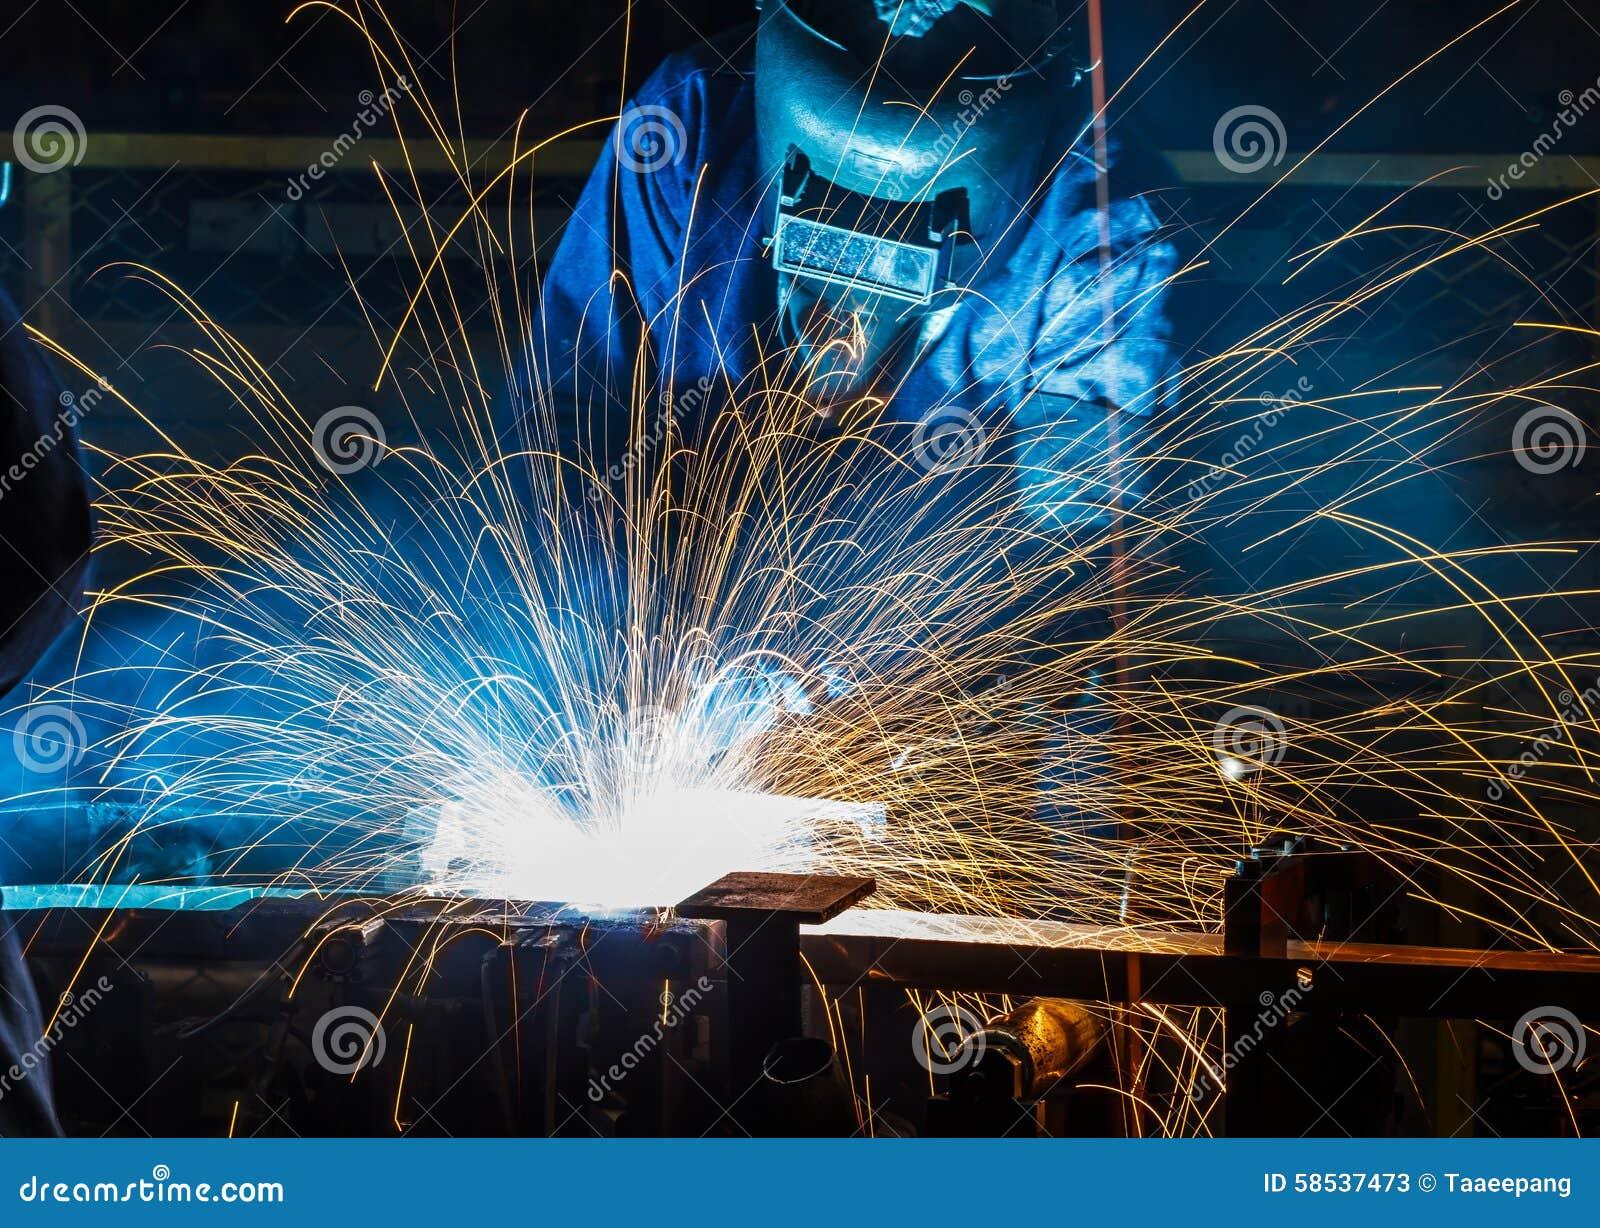 Uses and Advantages of Flux-Core Arc Welding - Tulsa Welding School